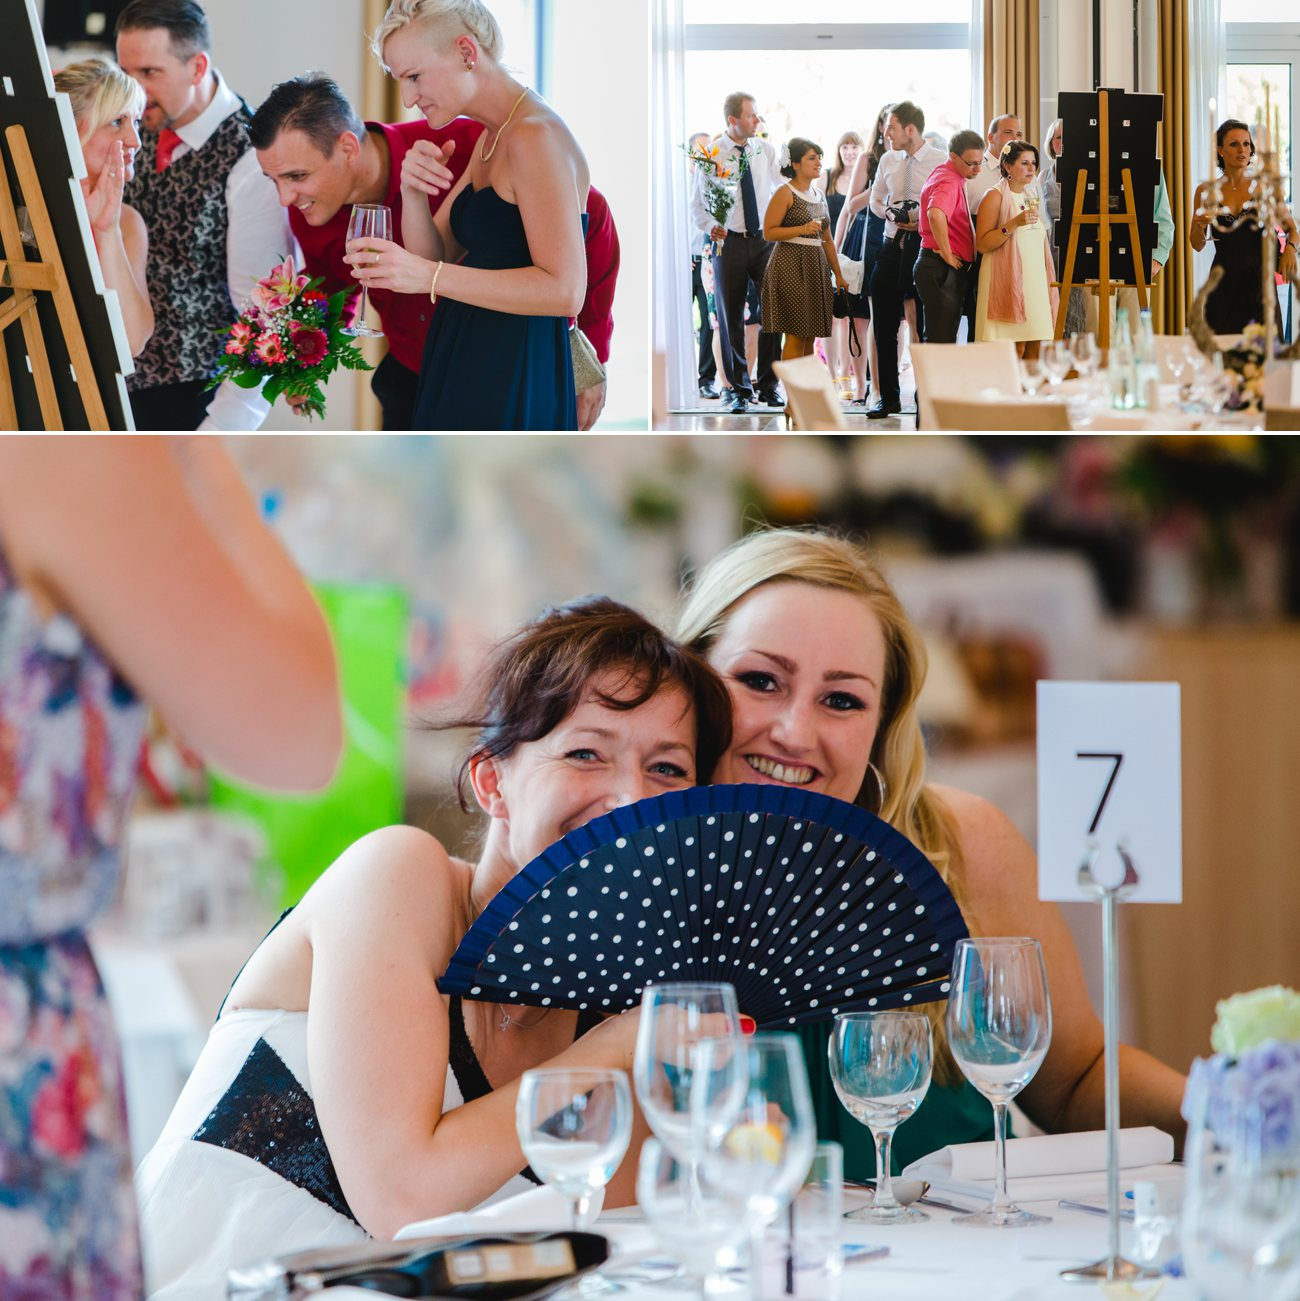 Hochzeitsfotograf_A-Rosa_Scharmuetzelsee080